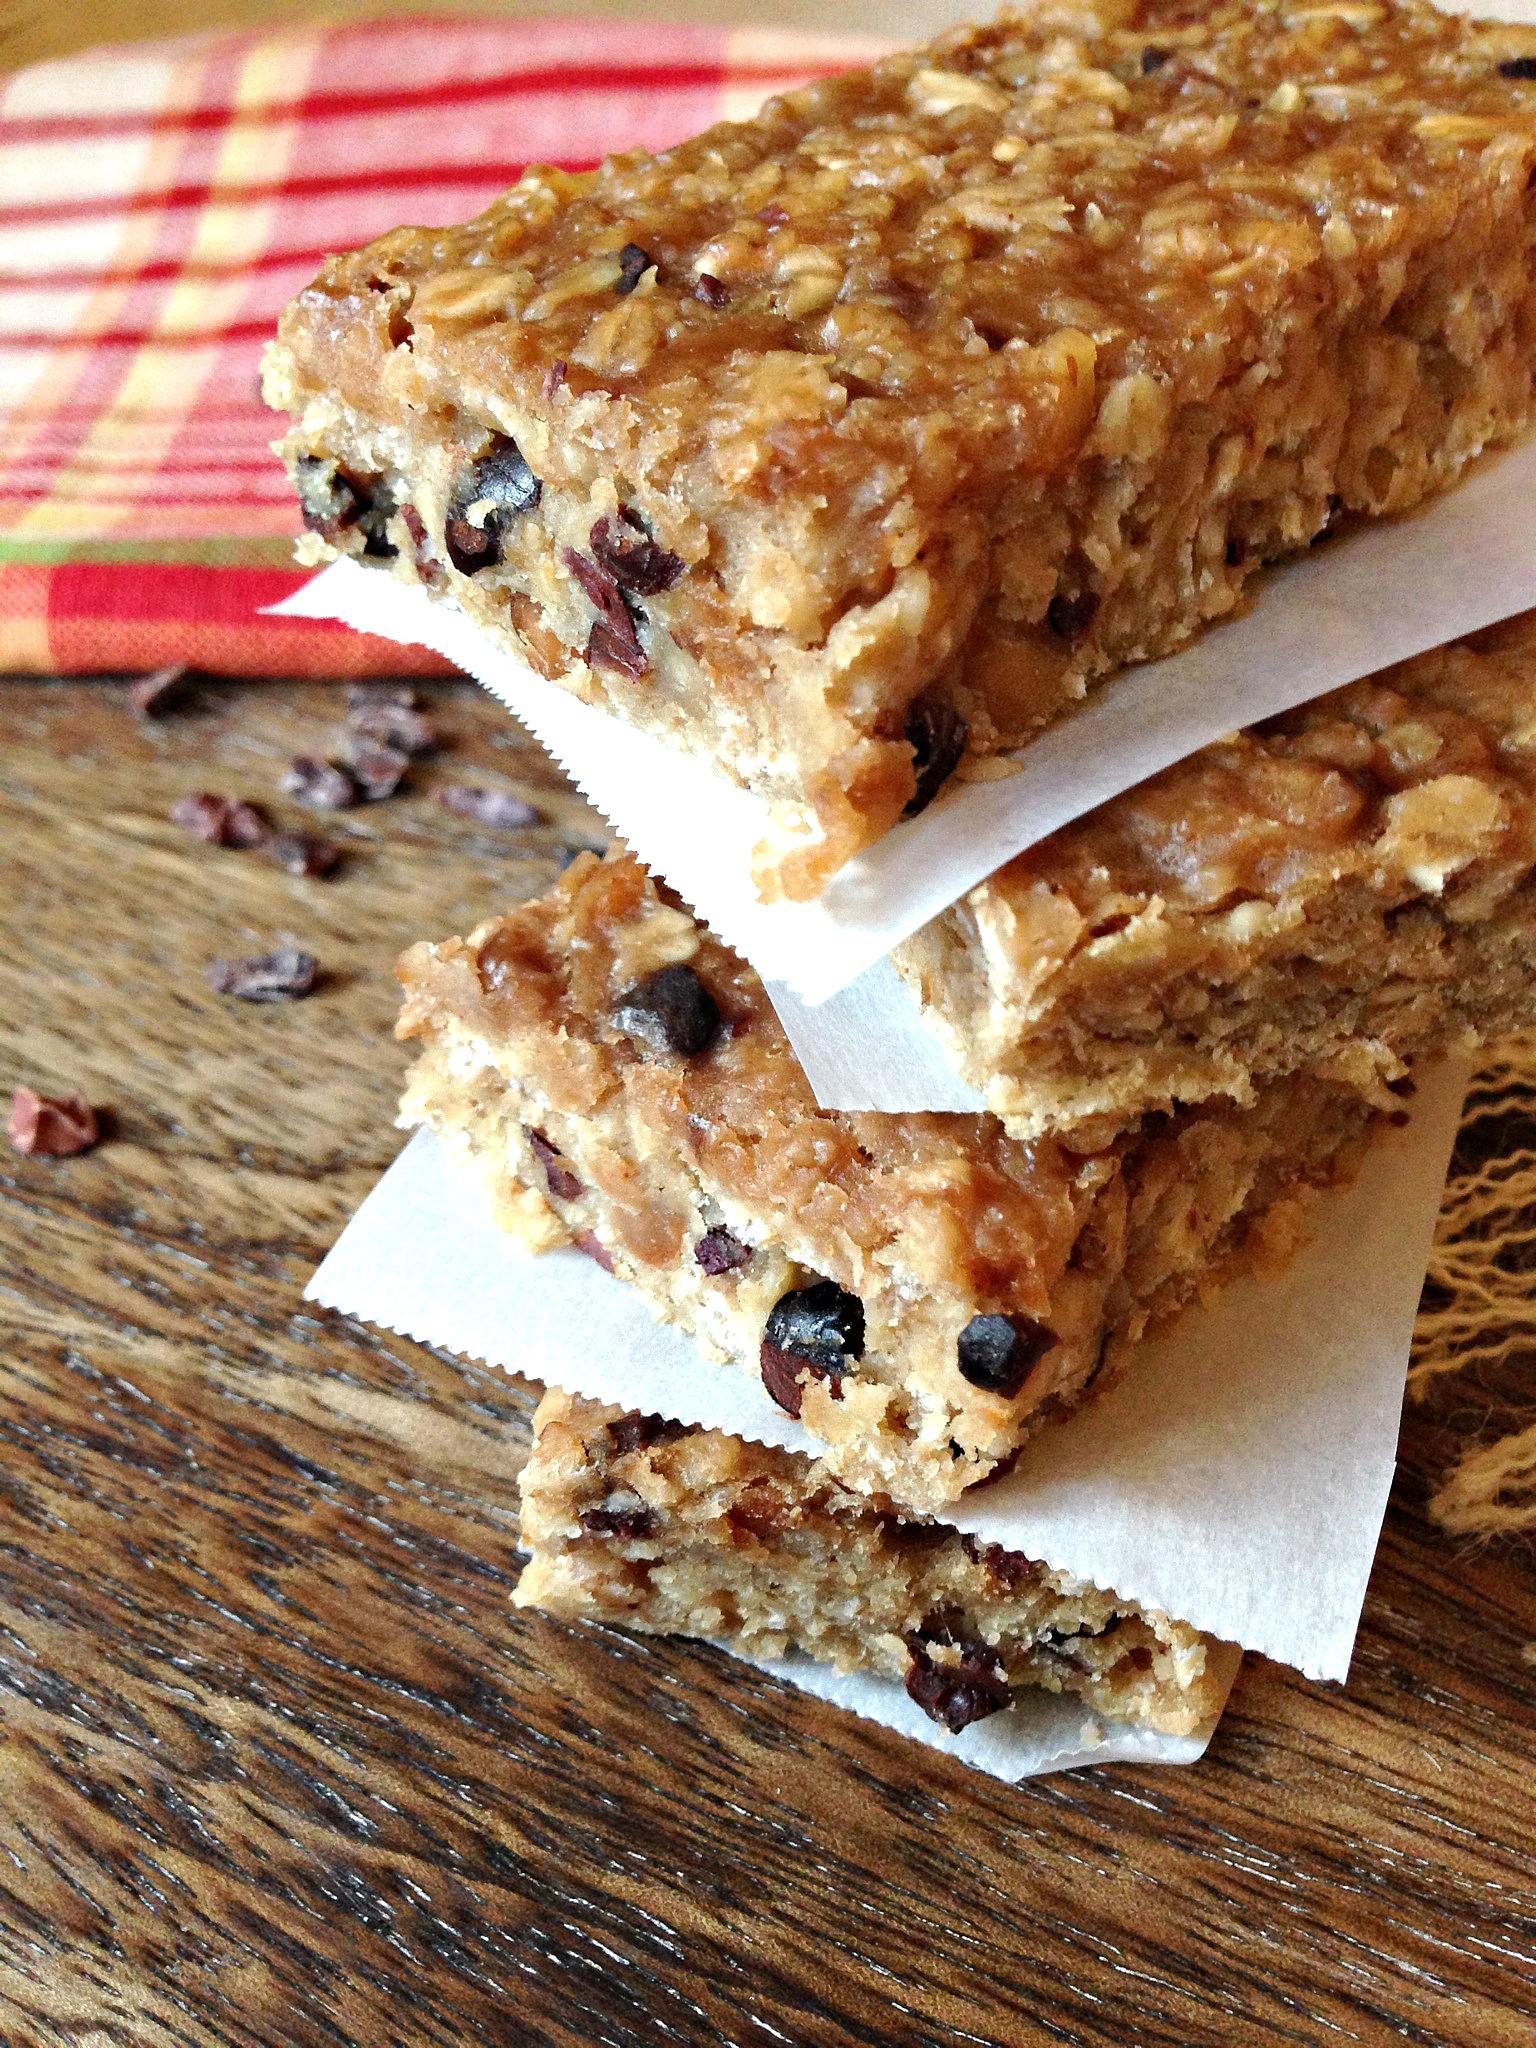 Banana, Peanut Butter & Oat Protein Bars